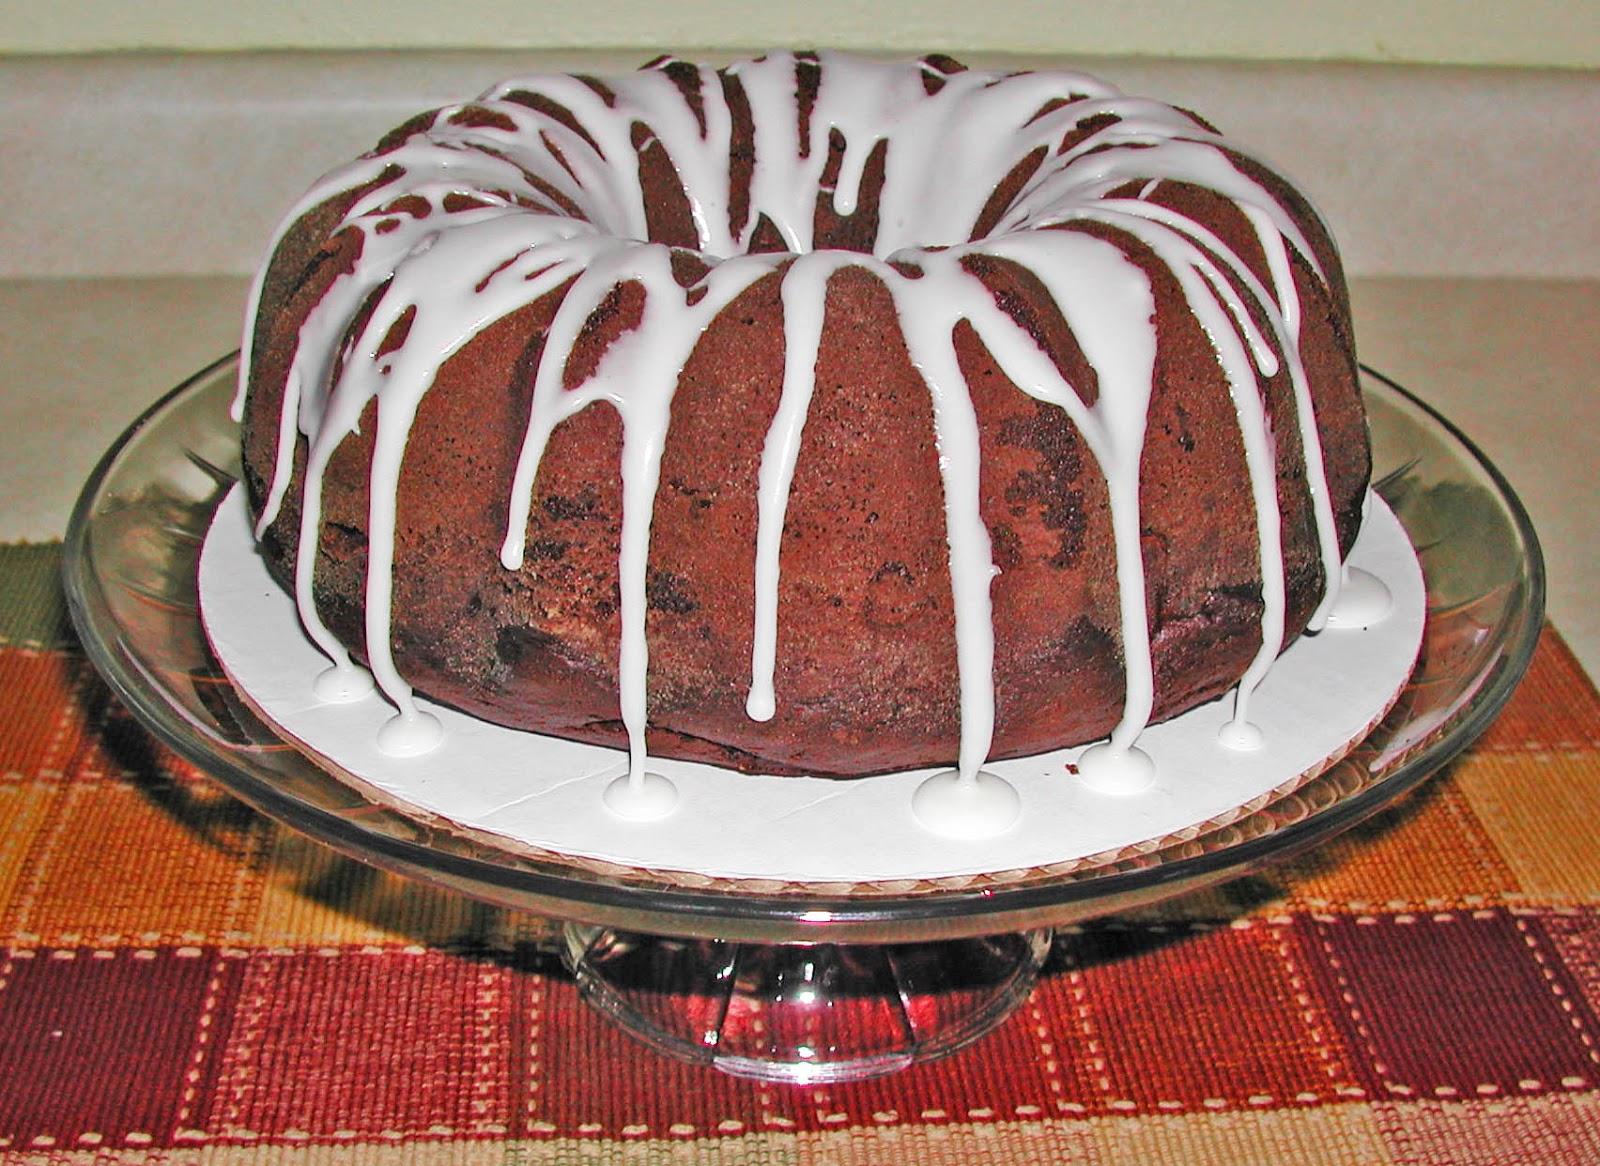 The Iowa Housewife Chocolate Almond Pound Cake